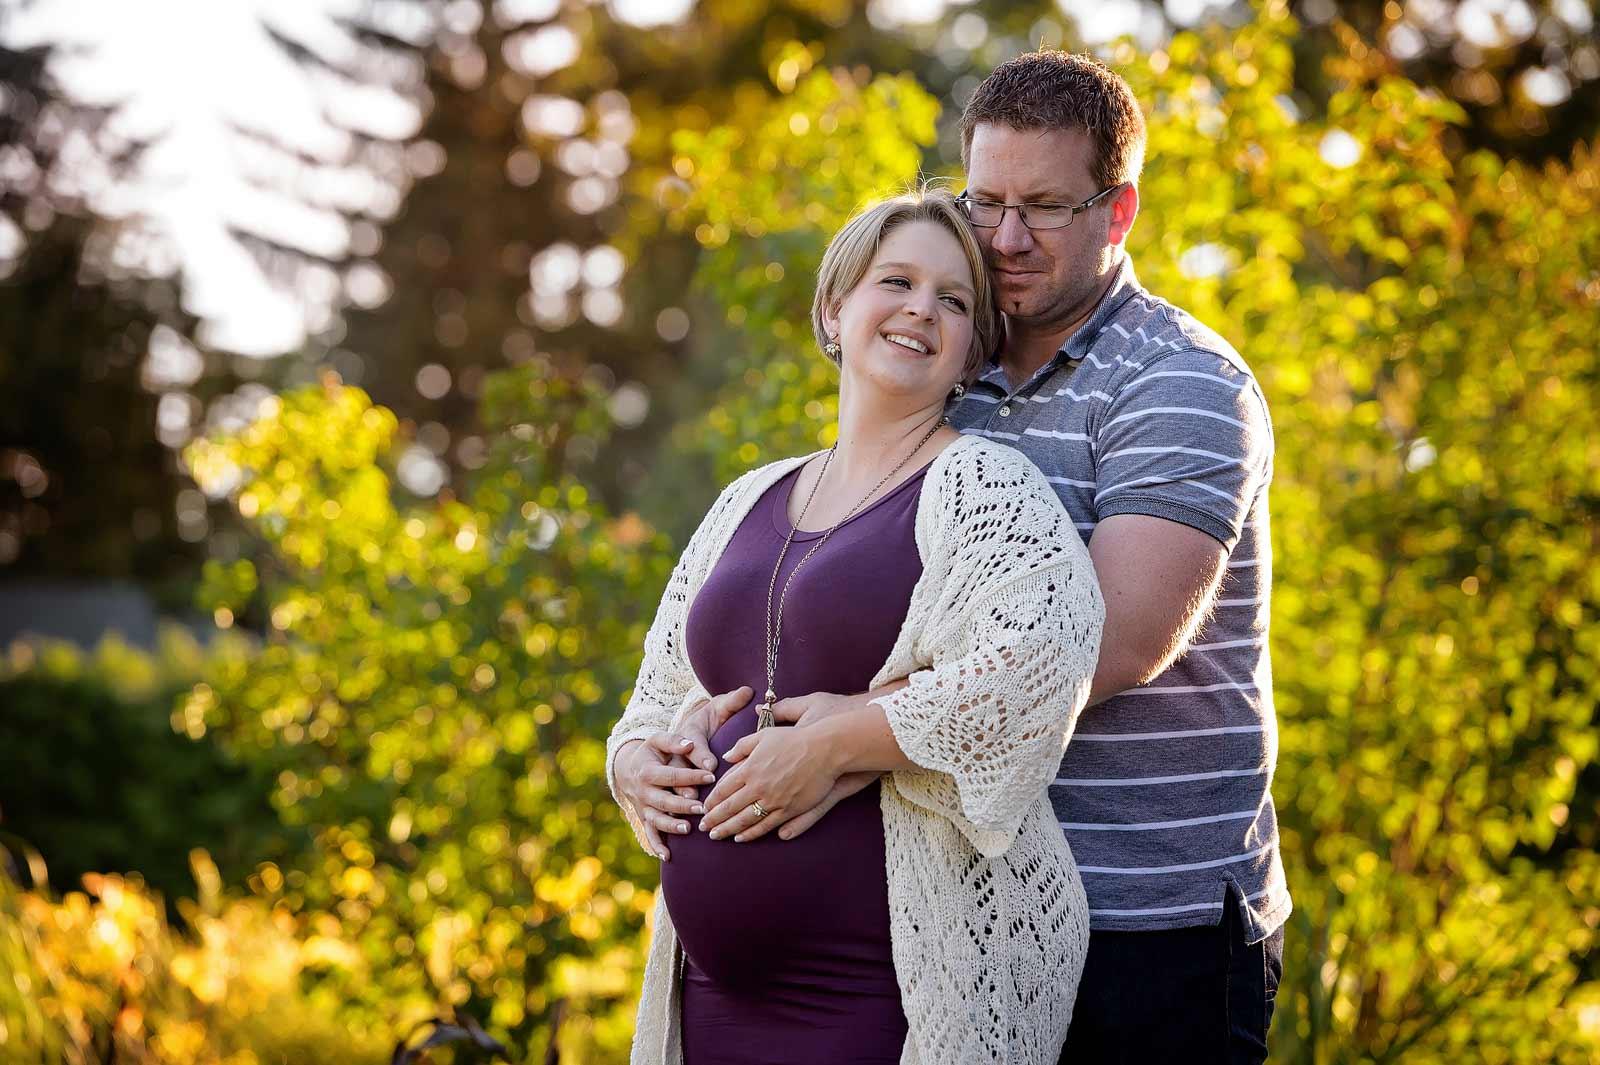 ashleyjustin-maternity-sneakpeek-05